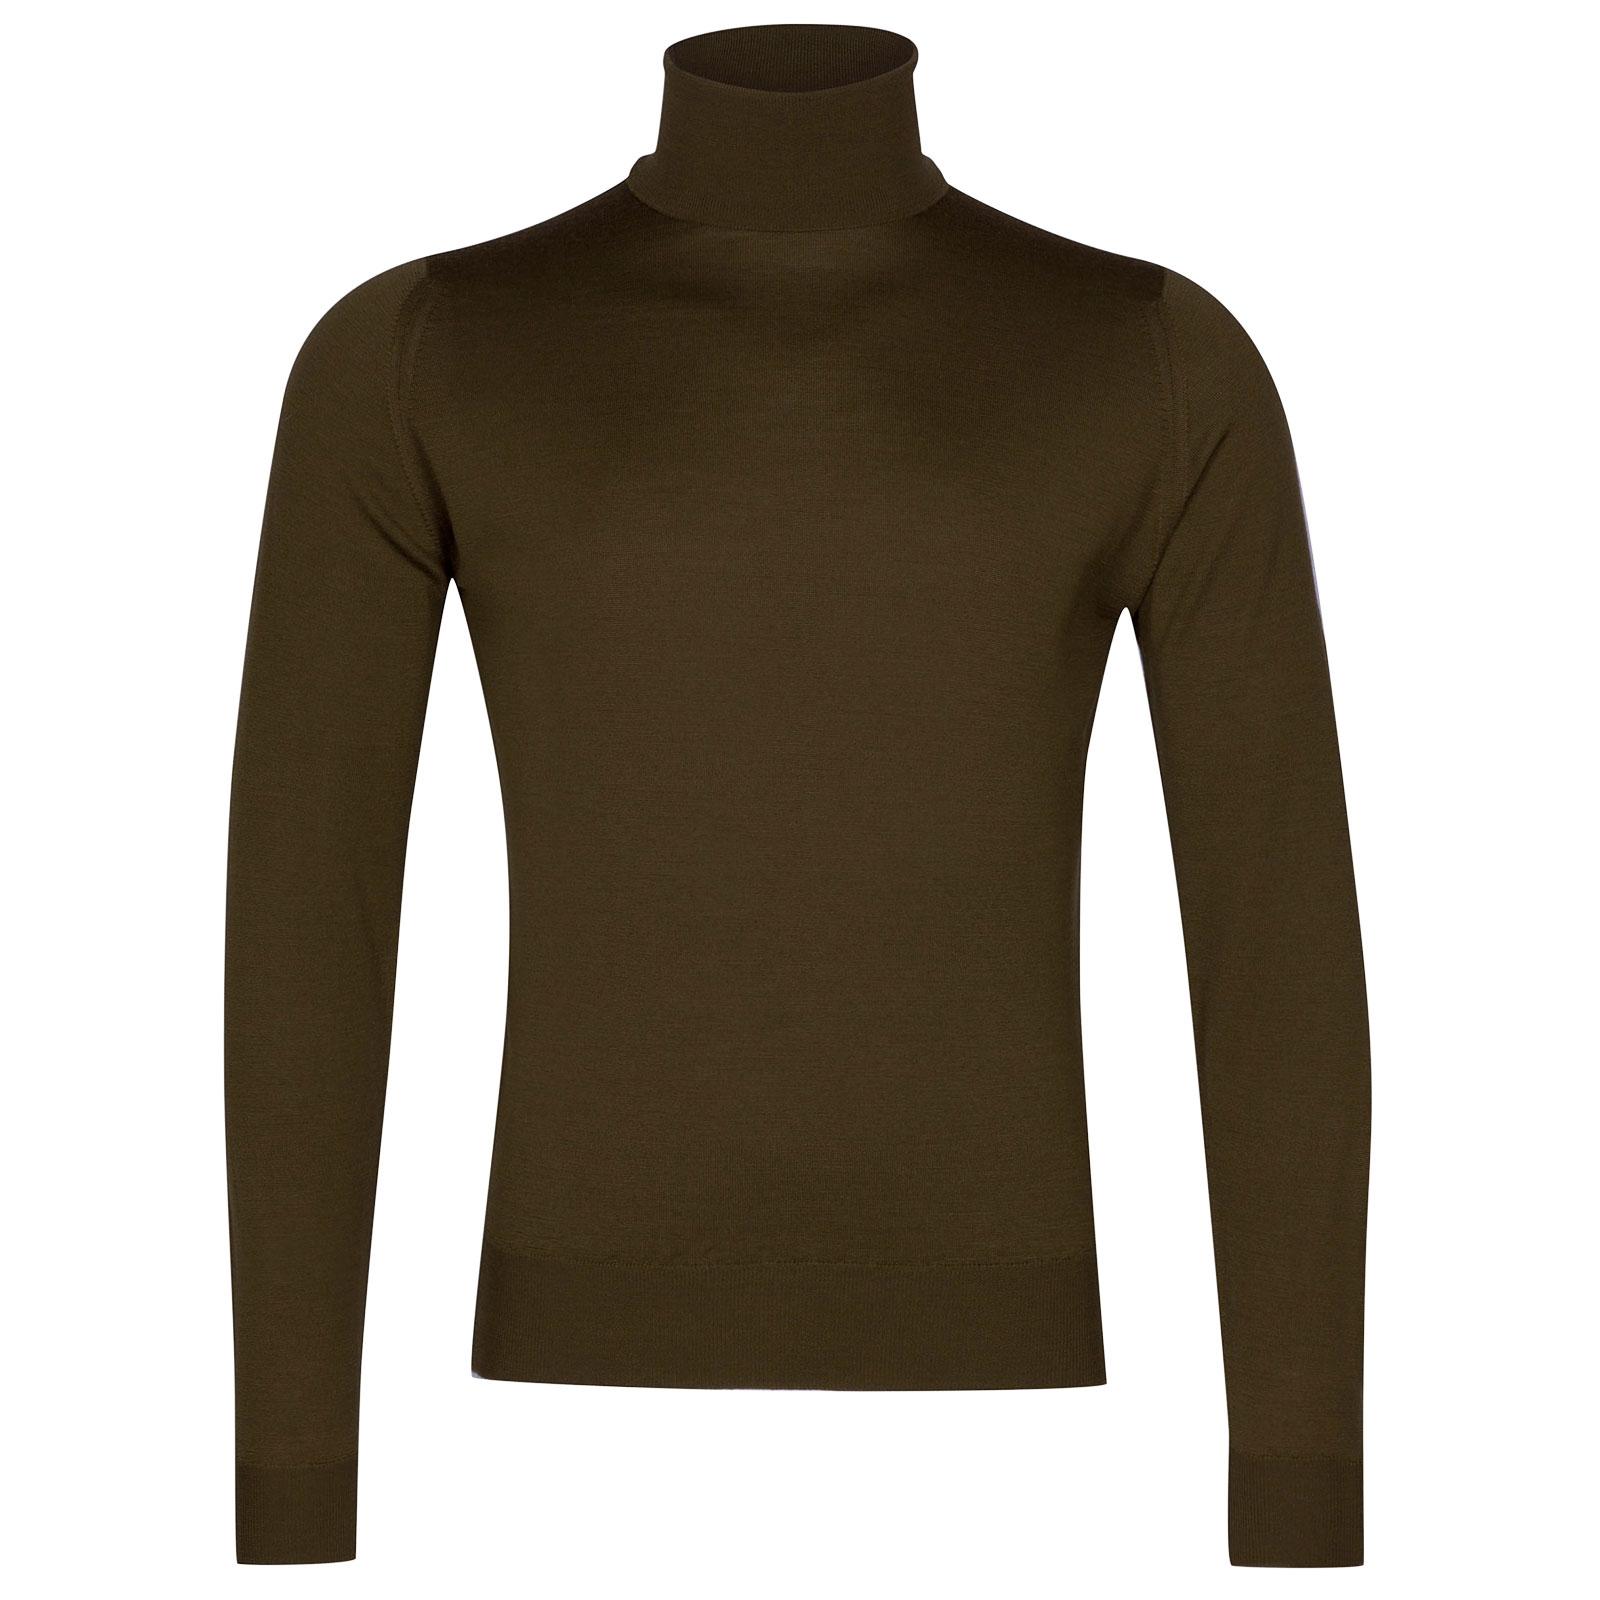 John Smedley Orta Merino Wool Pullover in Khaki-M